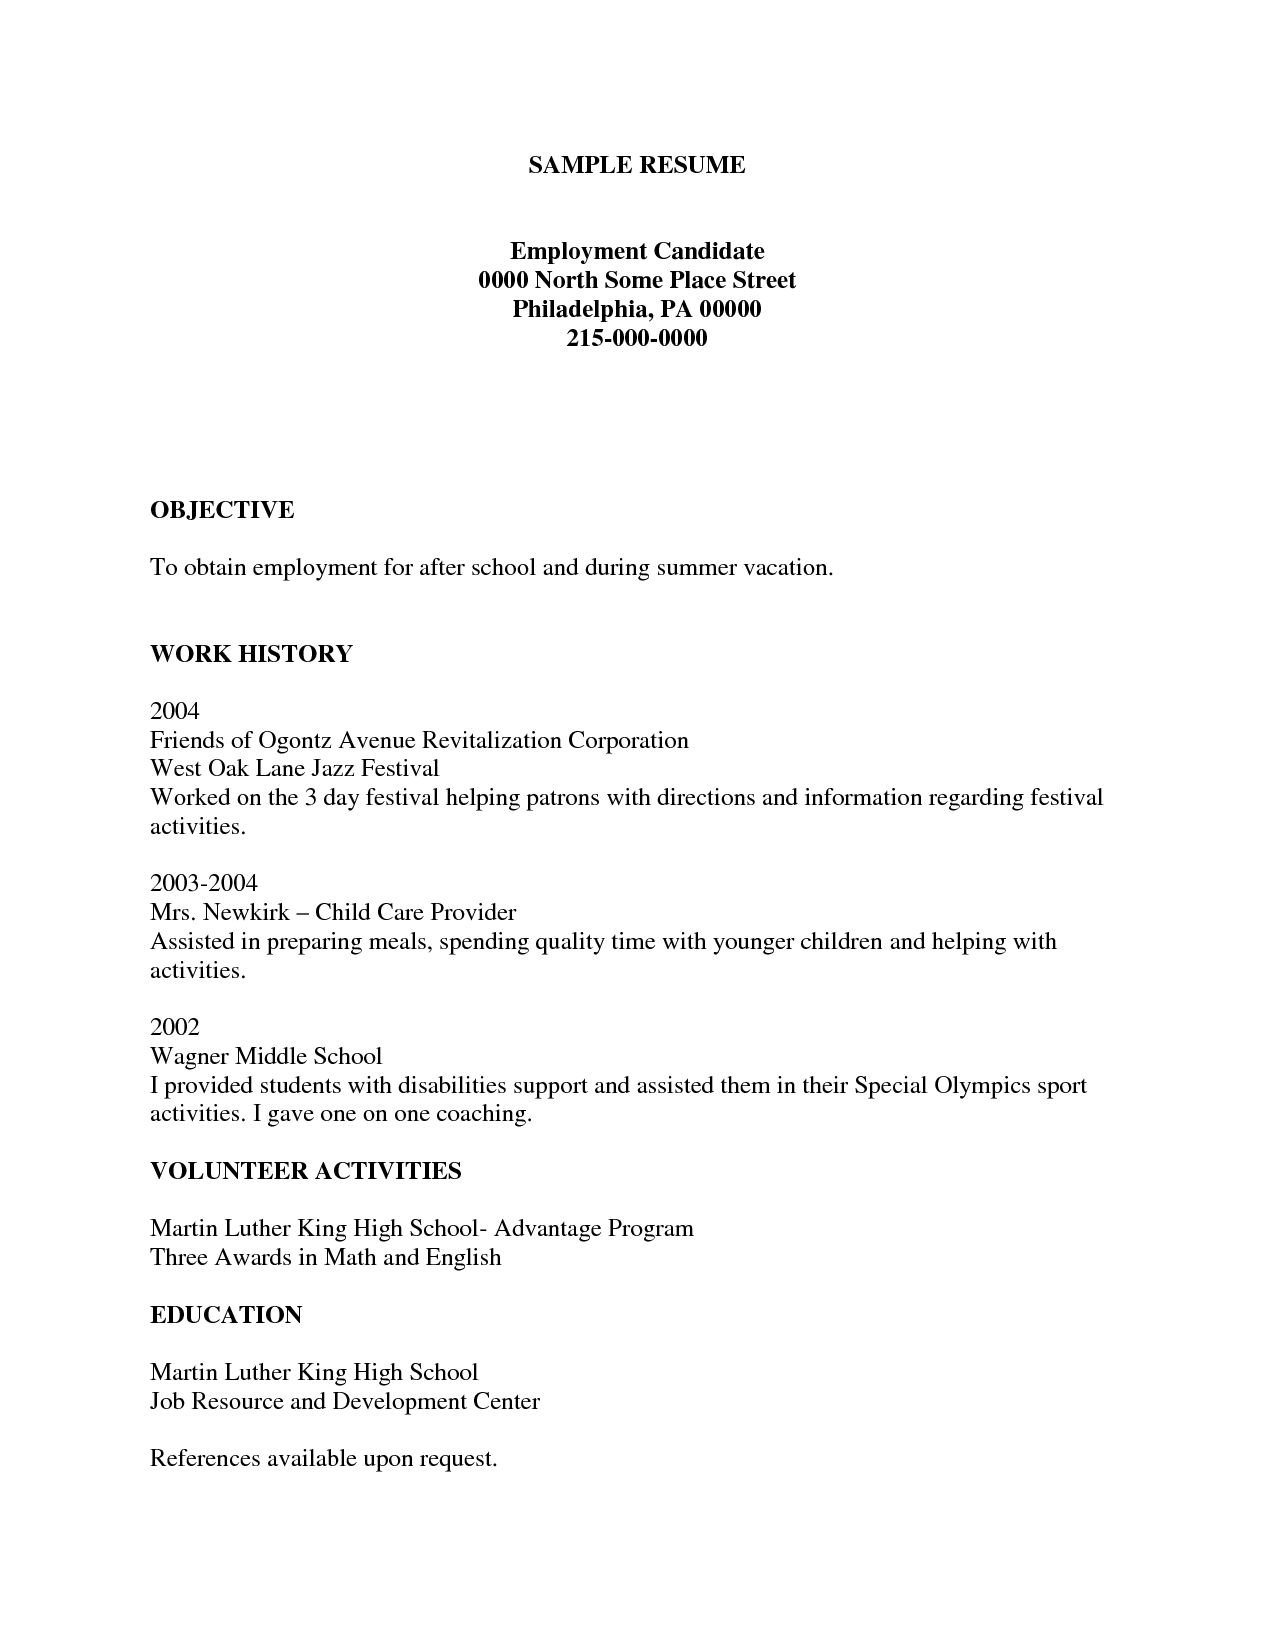 printable resume templates pinterest free resume builder